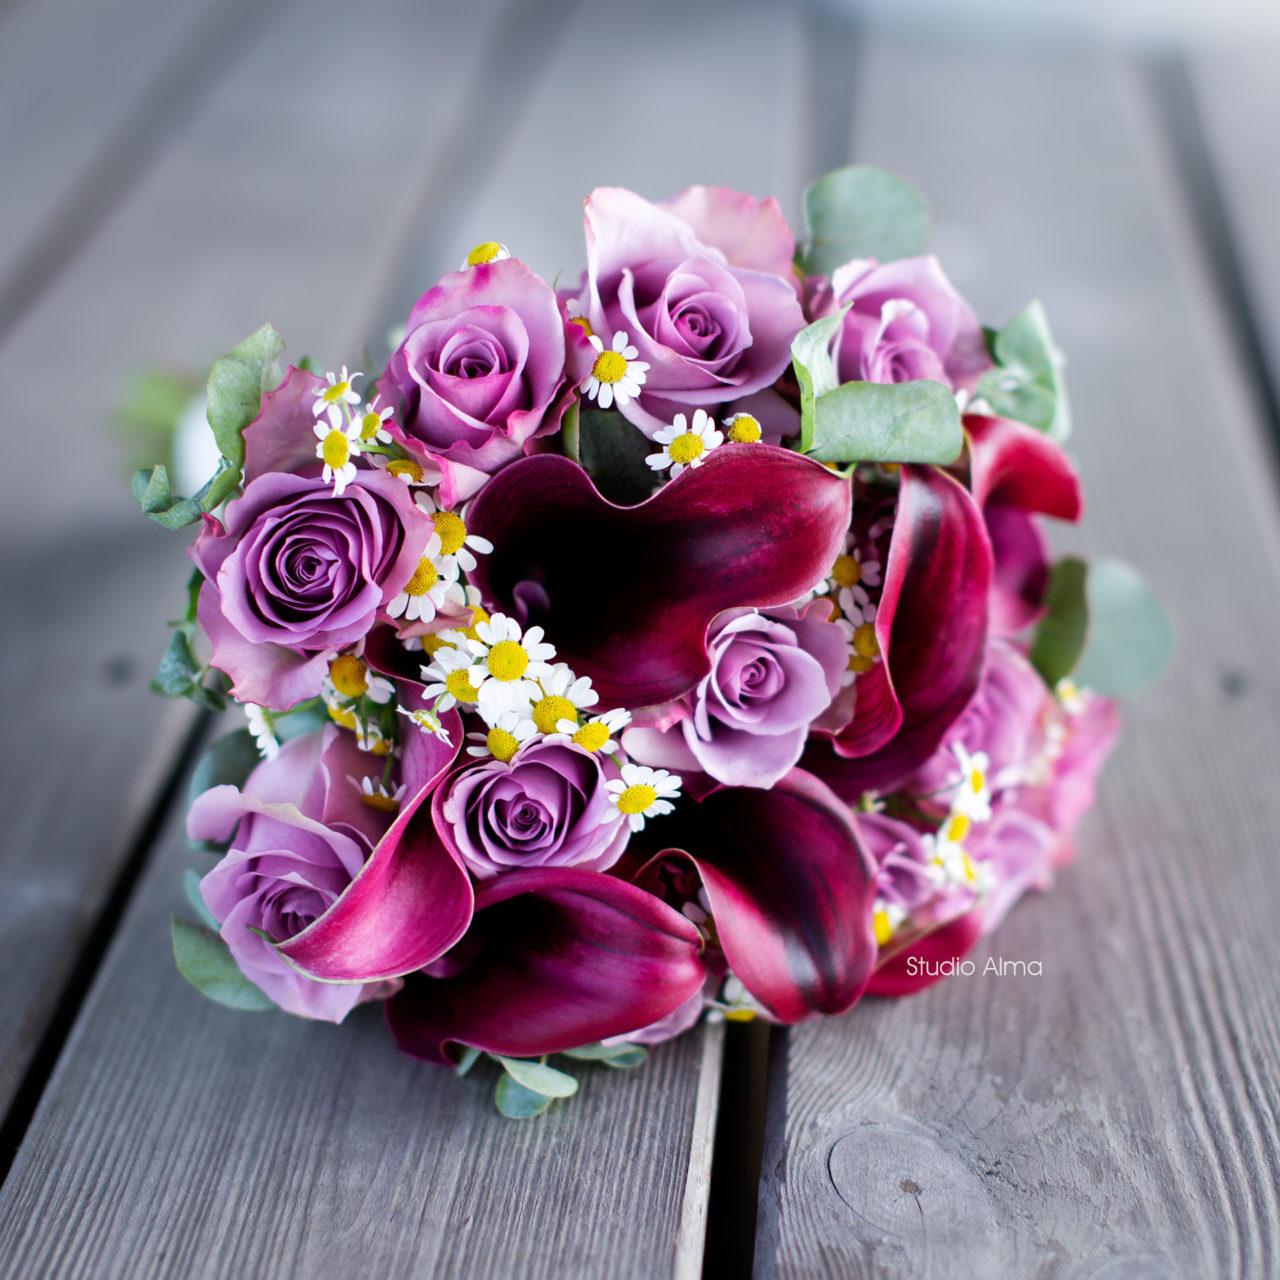 brudebukett-bryllup-blomster-fotograf-studioalma